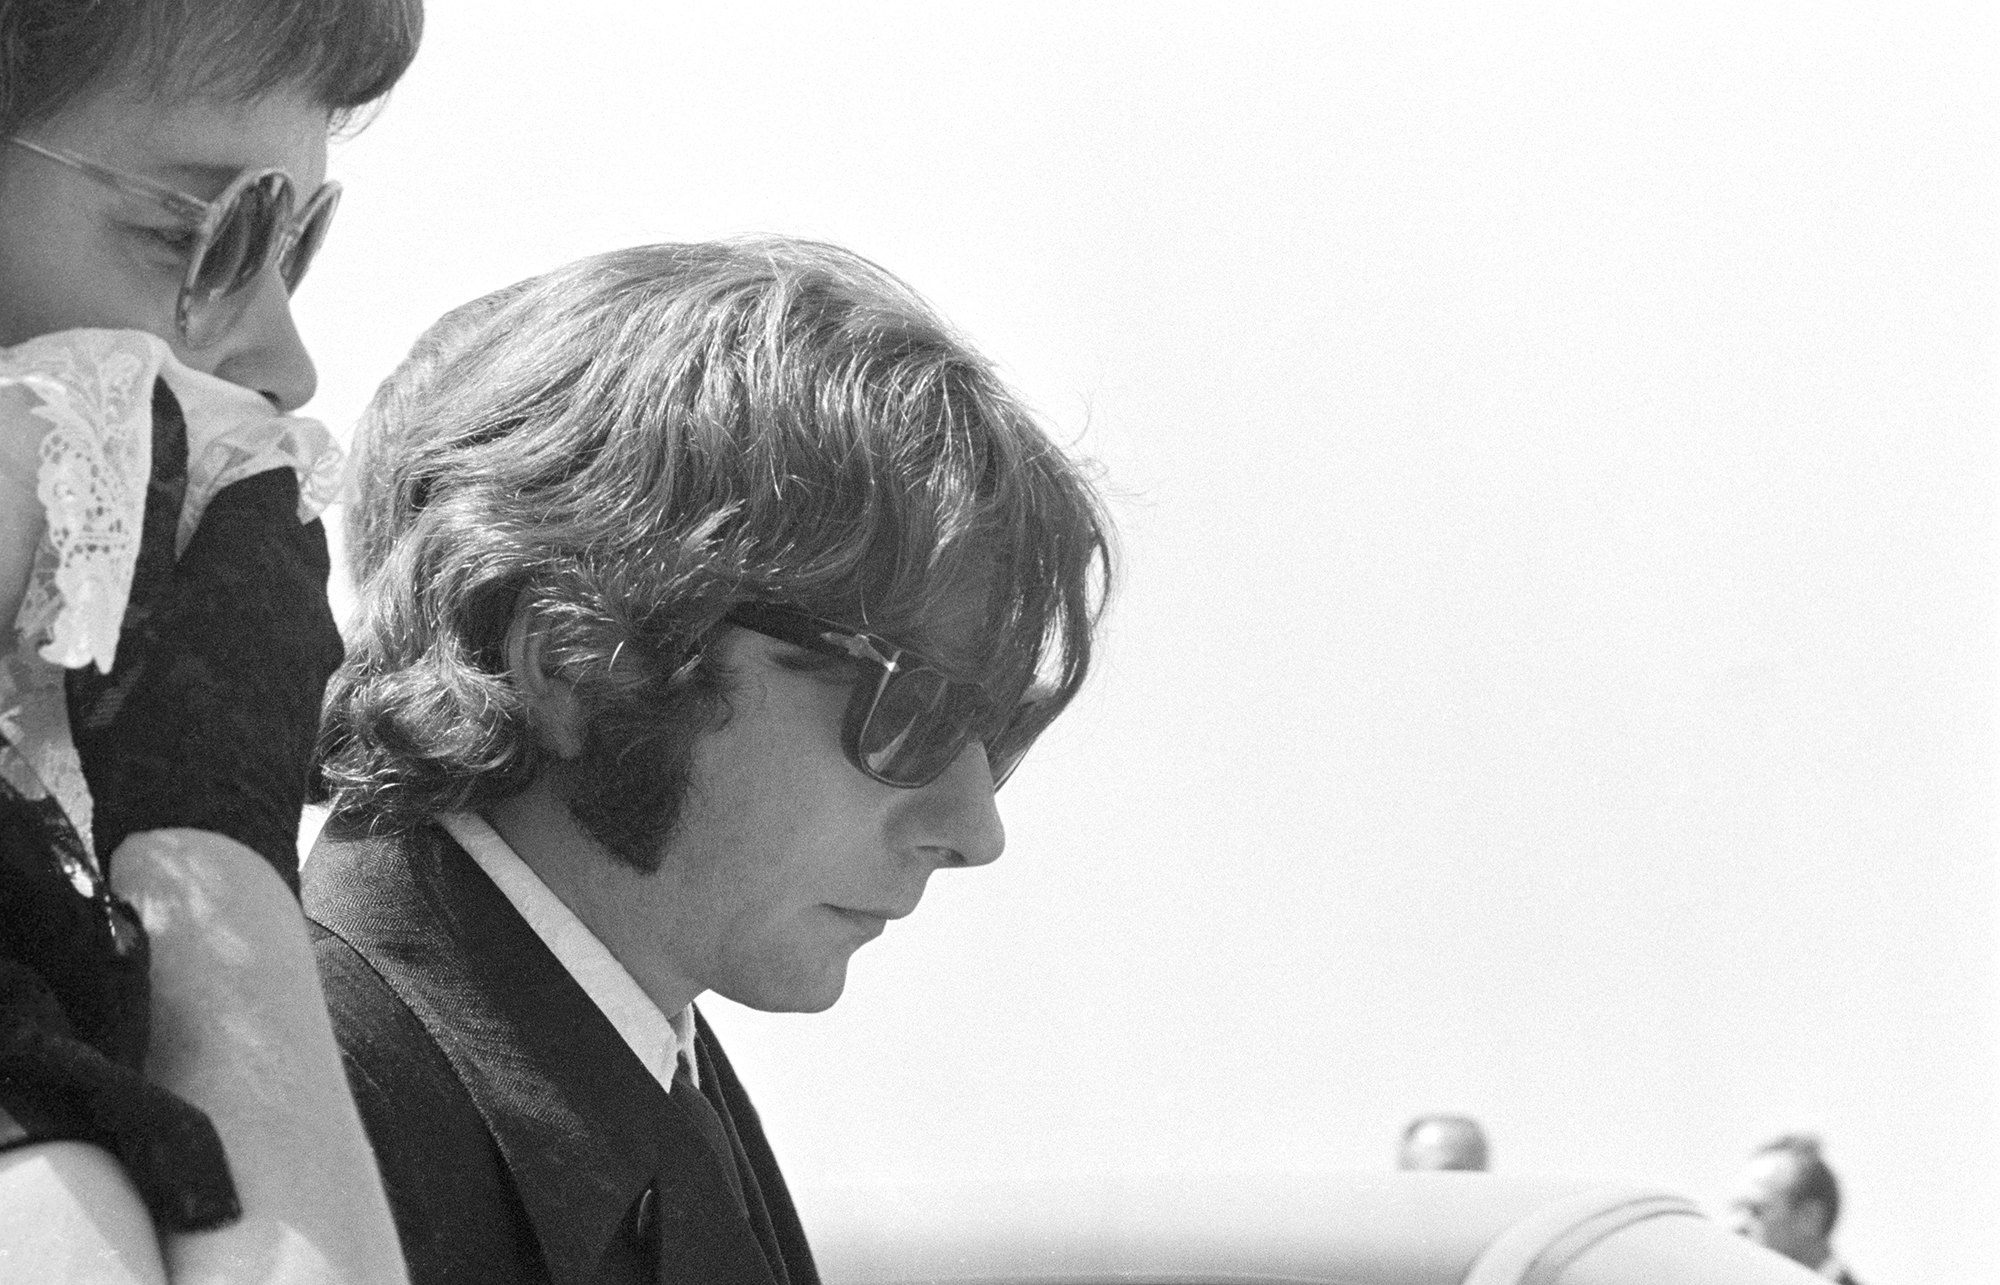 Роман Полански напохоронах Шэрон Тейт, 1969 год